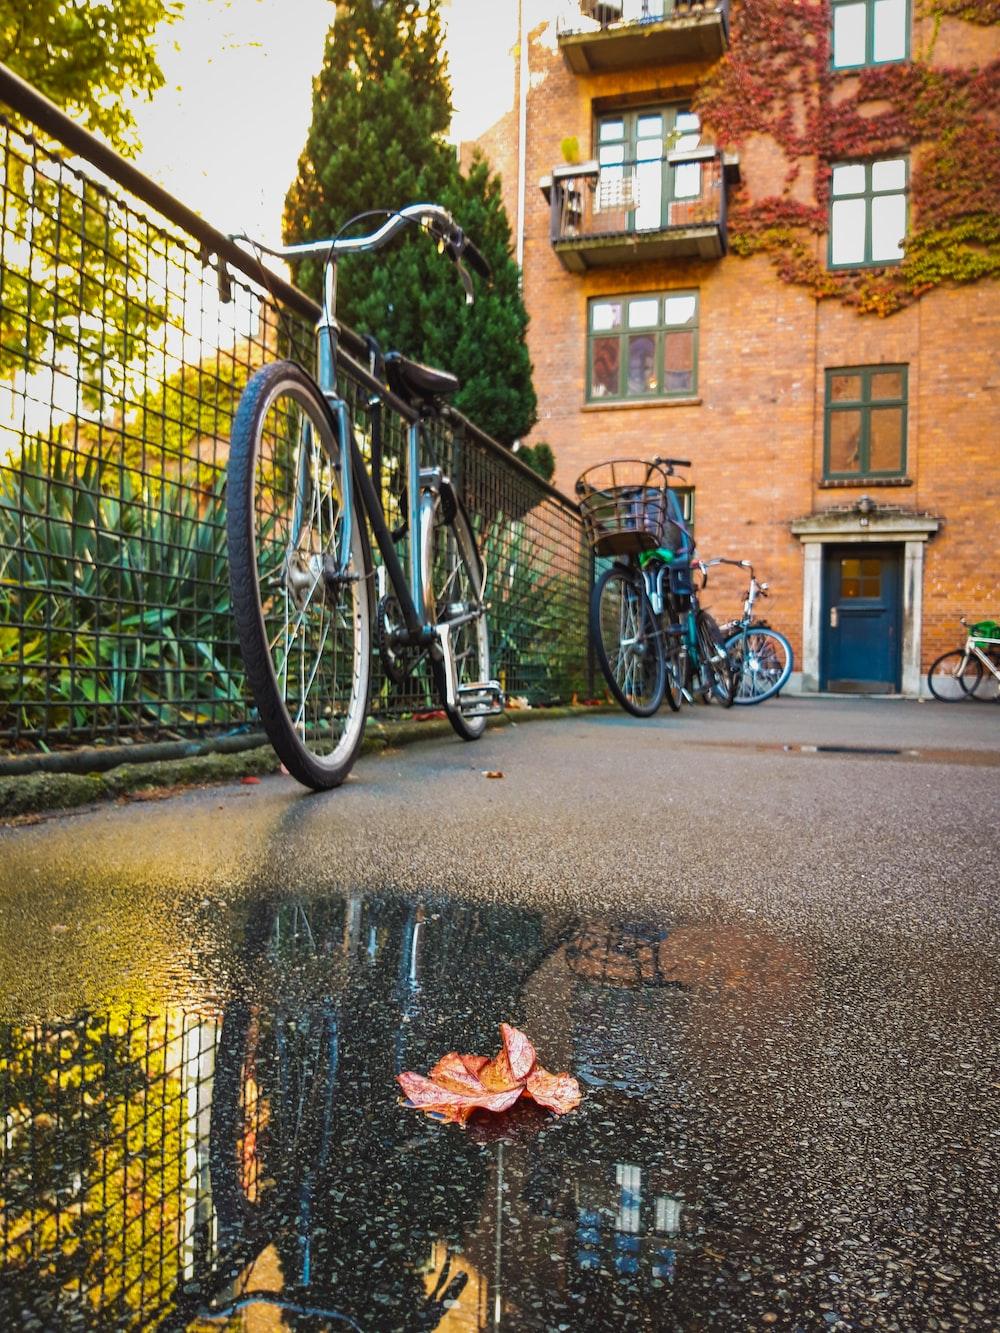 black commuter bike parked beside brown concrete building during daytime